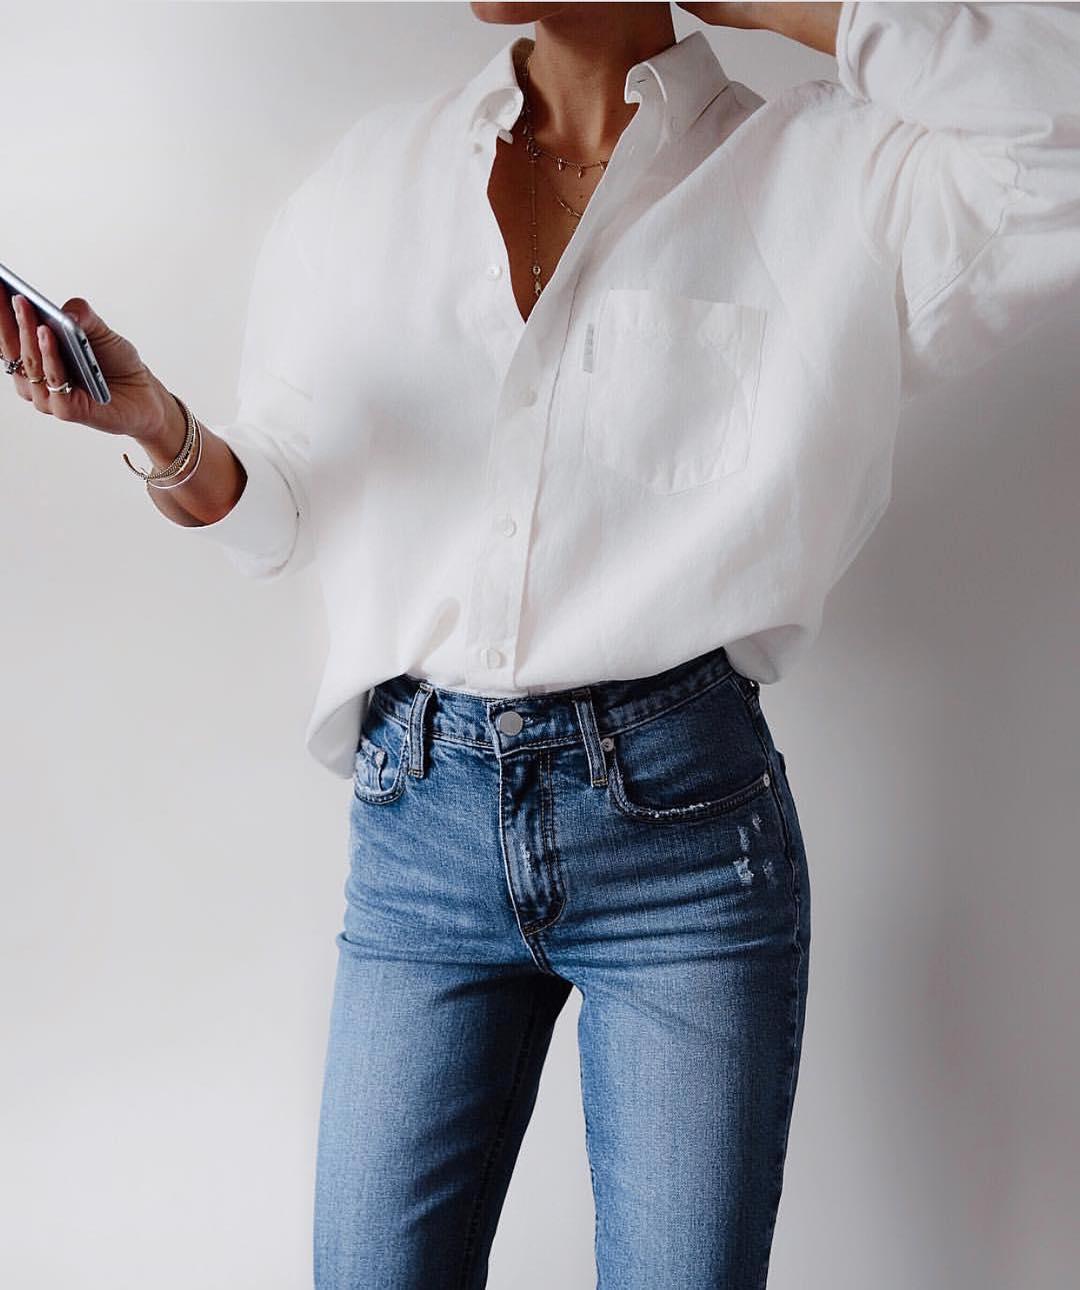 Базовый гардероб осени 2019 фото 4